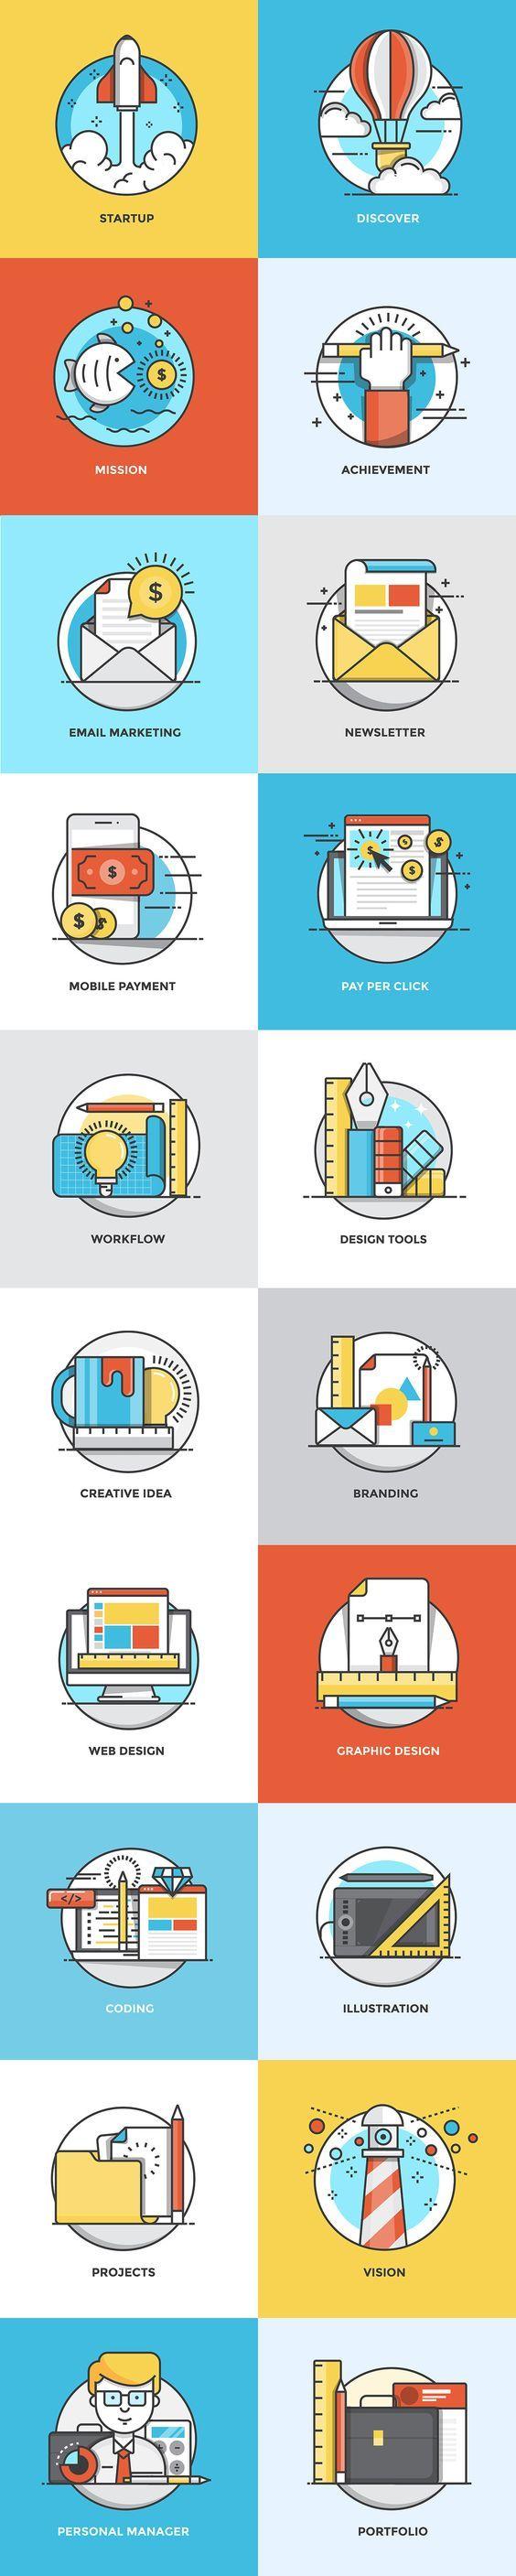 28 best infographics images on Pinterest | Graph design, Info ...